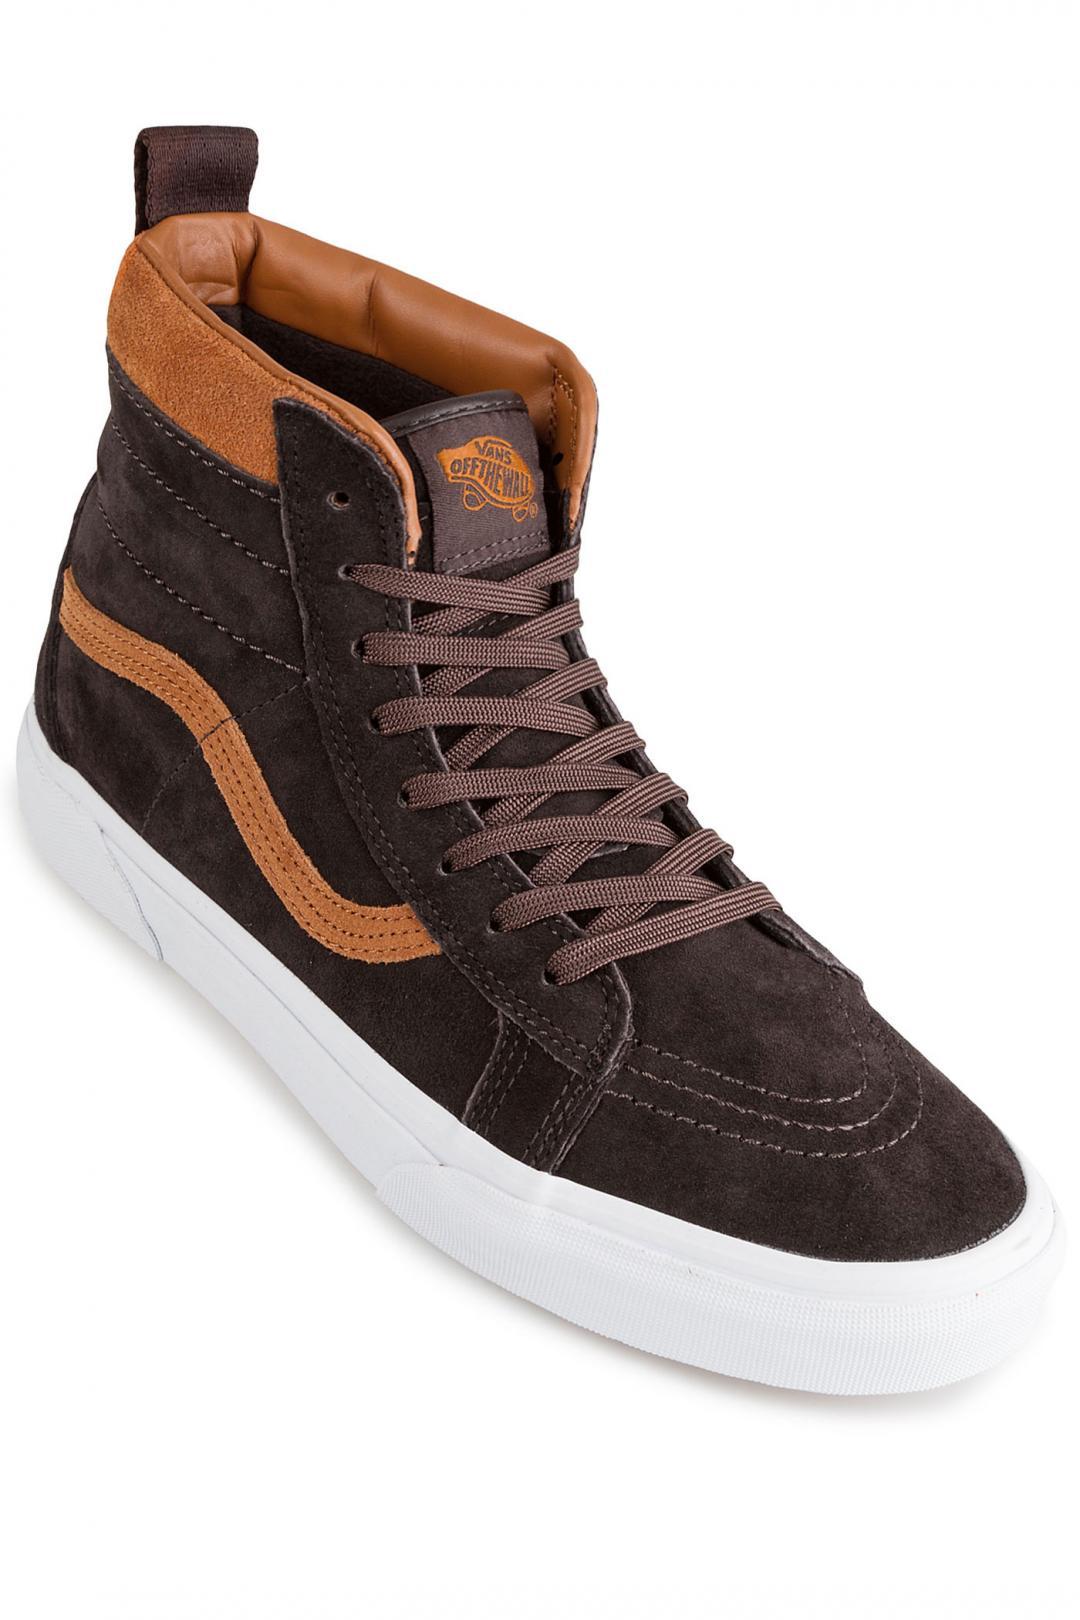 Uomo Vans Sk8-Hi MTE Suede chocolate torte | Sneaker